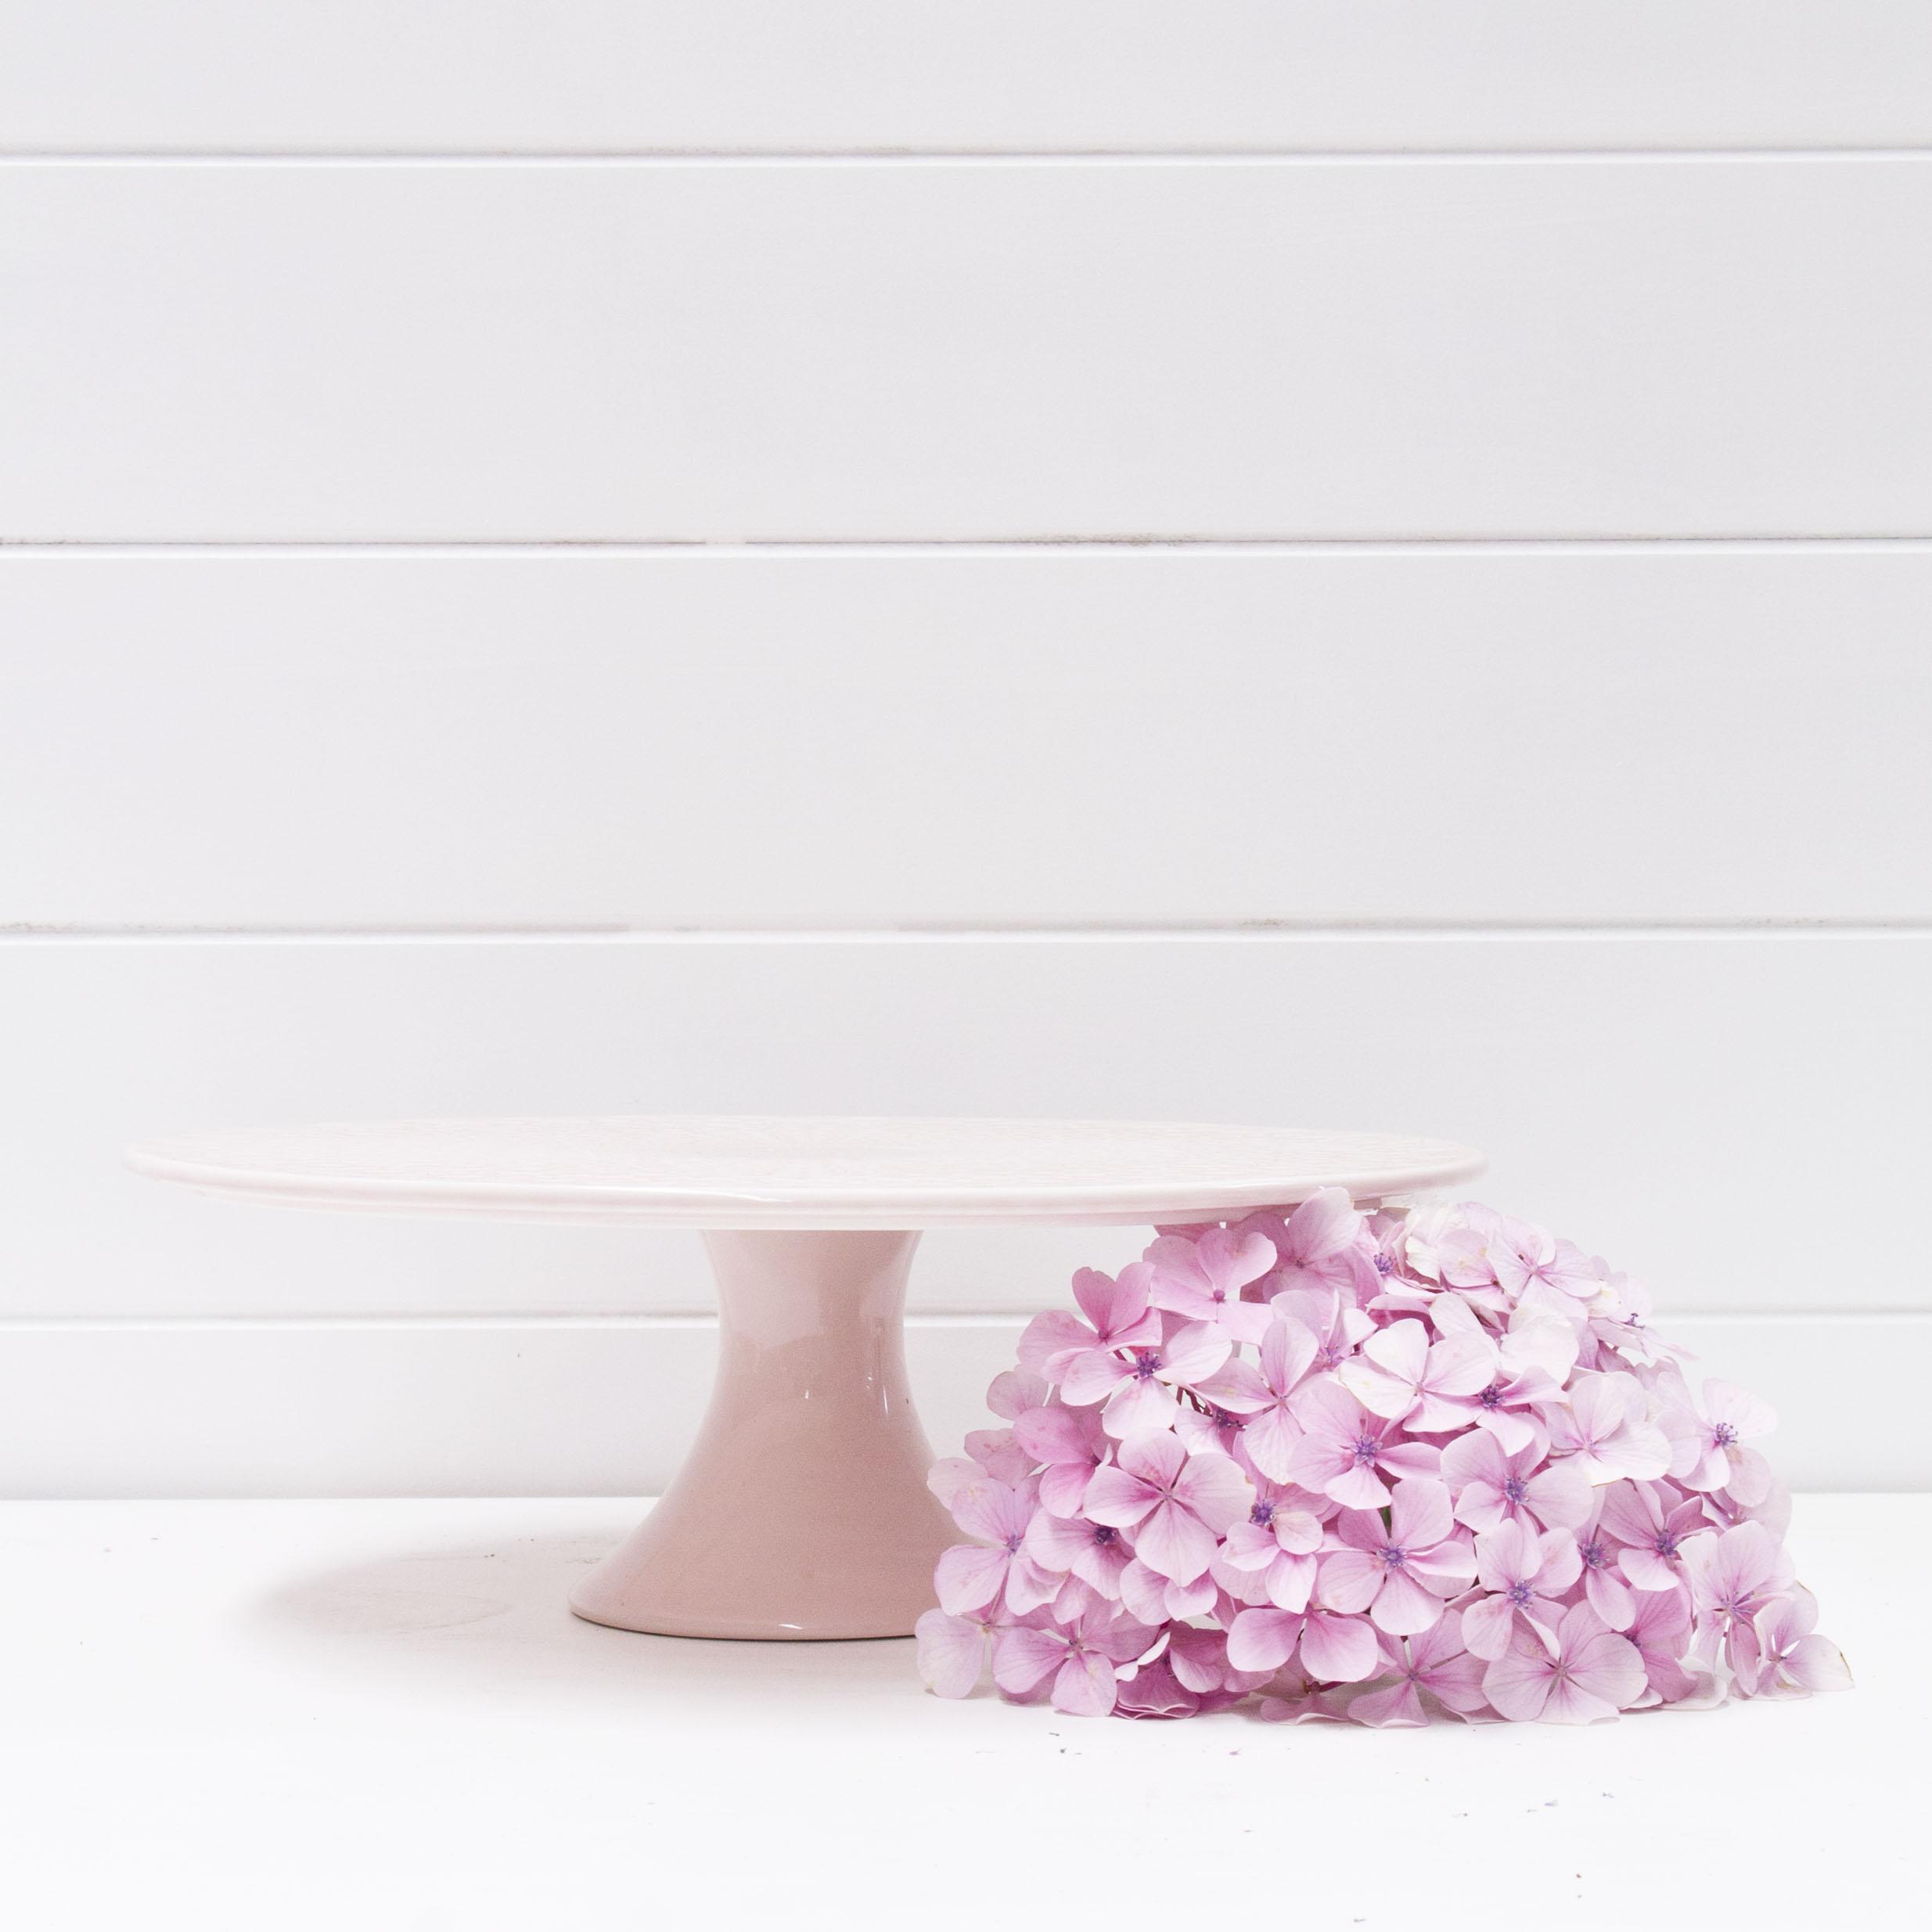 Blush Pink Cake Stand